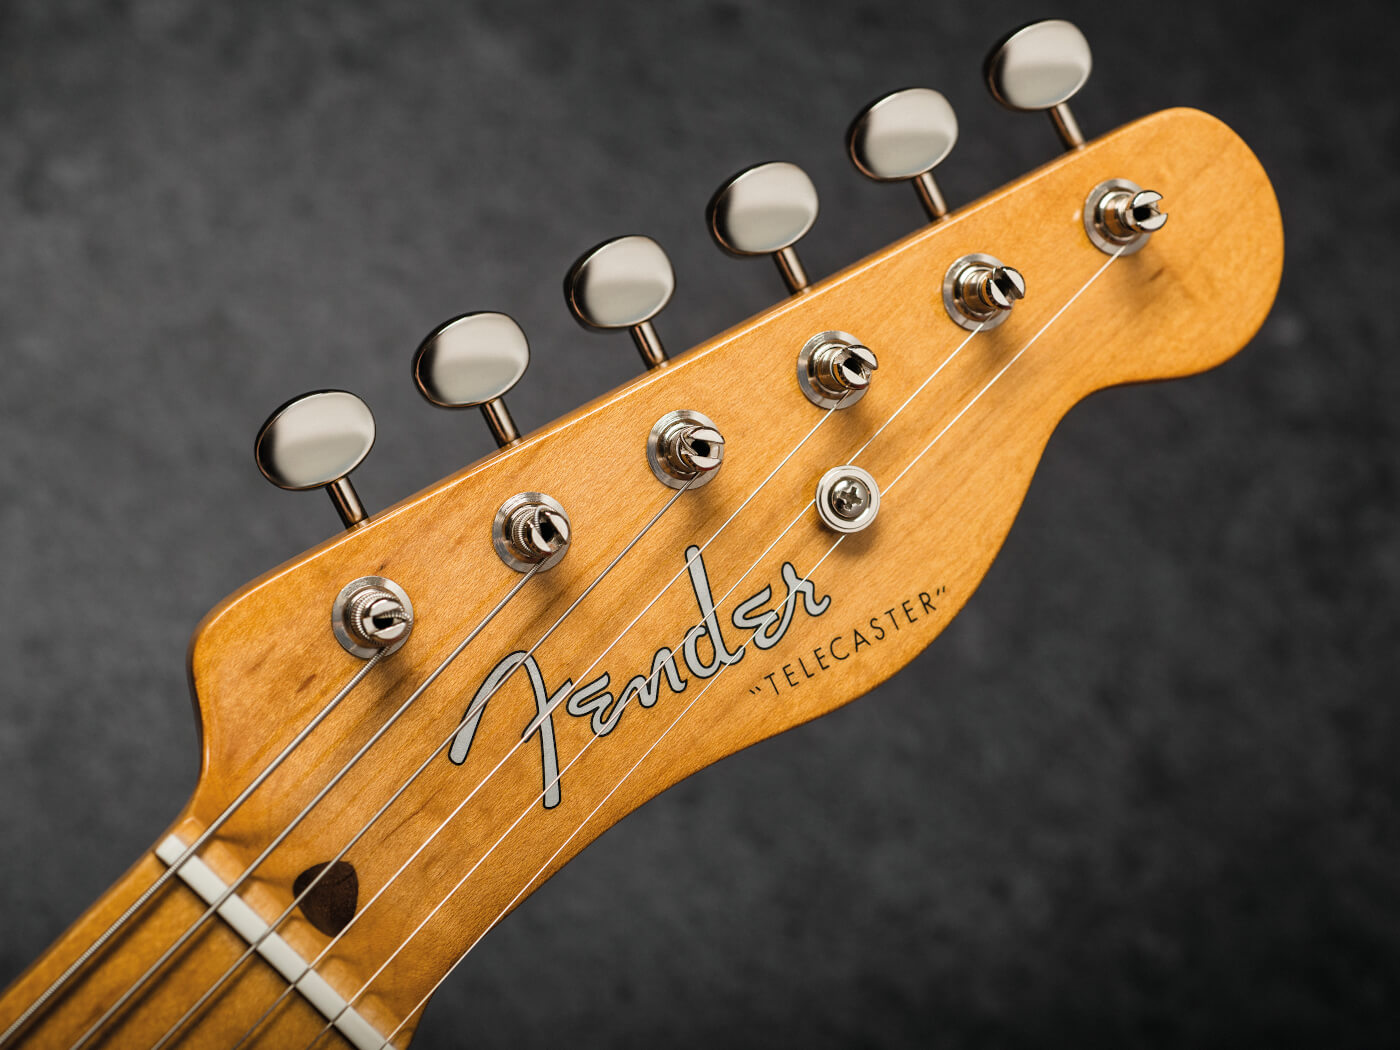 Fender Vintera 50s Telecaster Fiesta Red vintage style machineheads